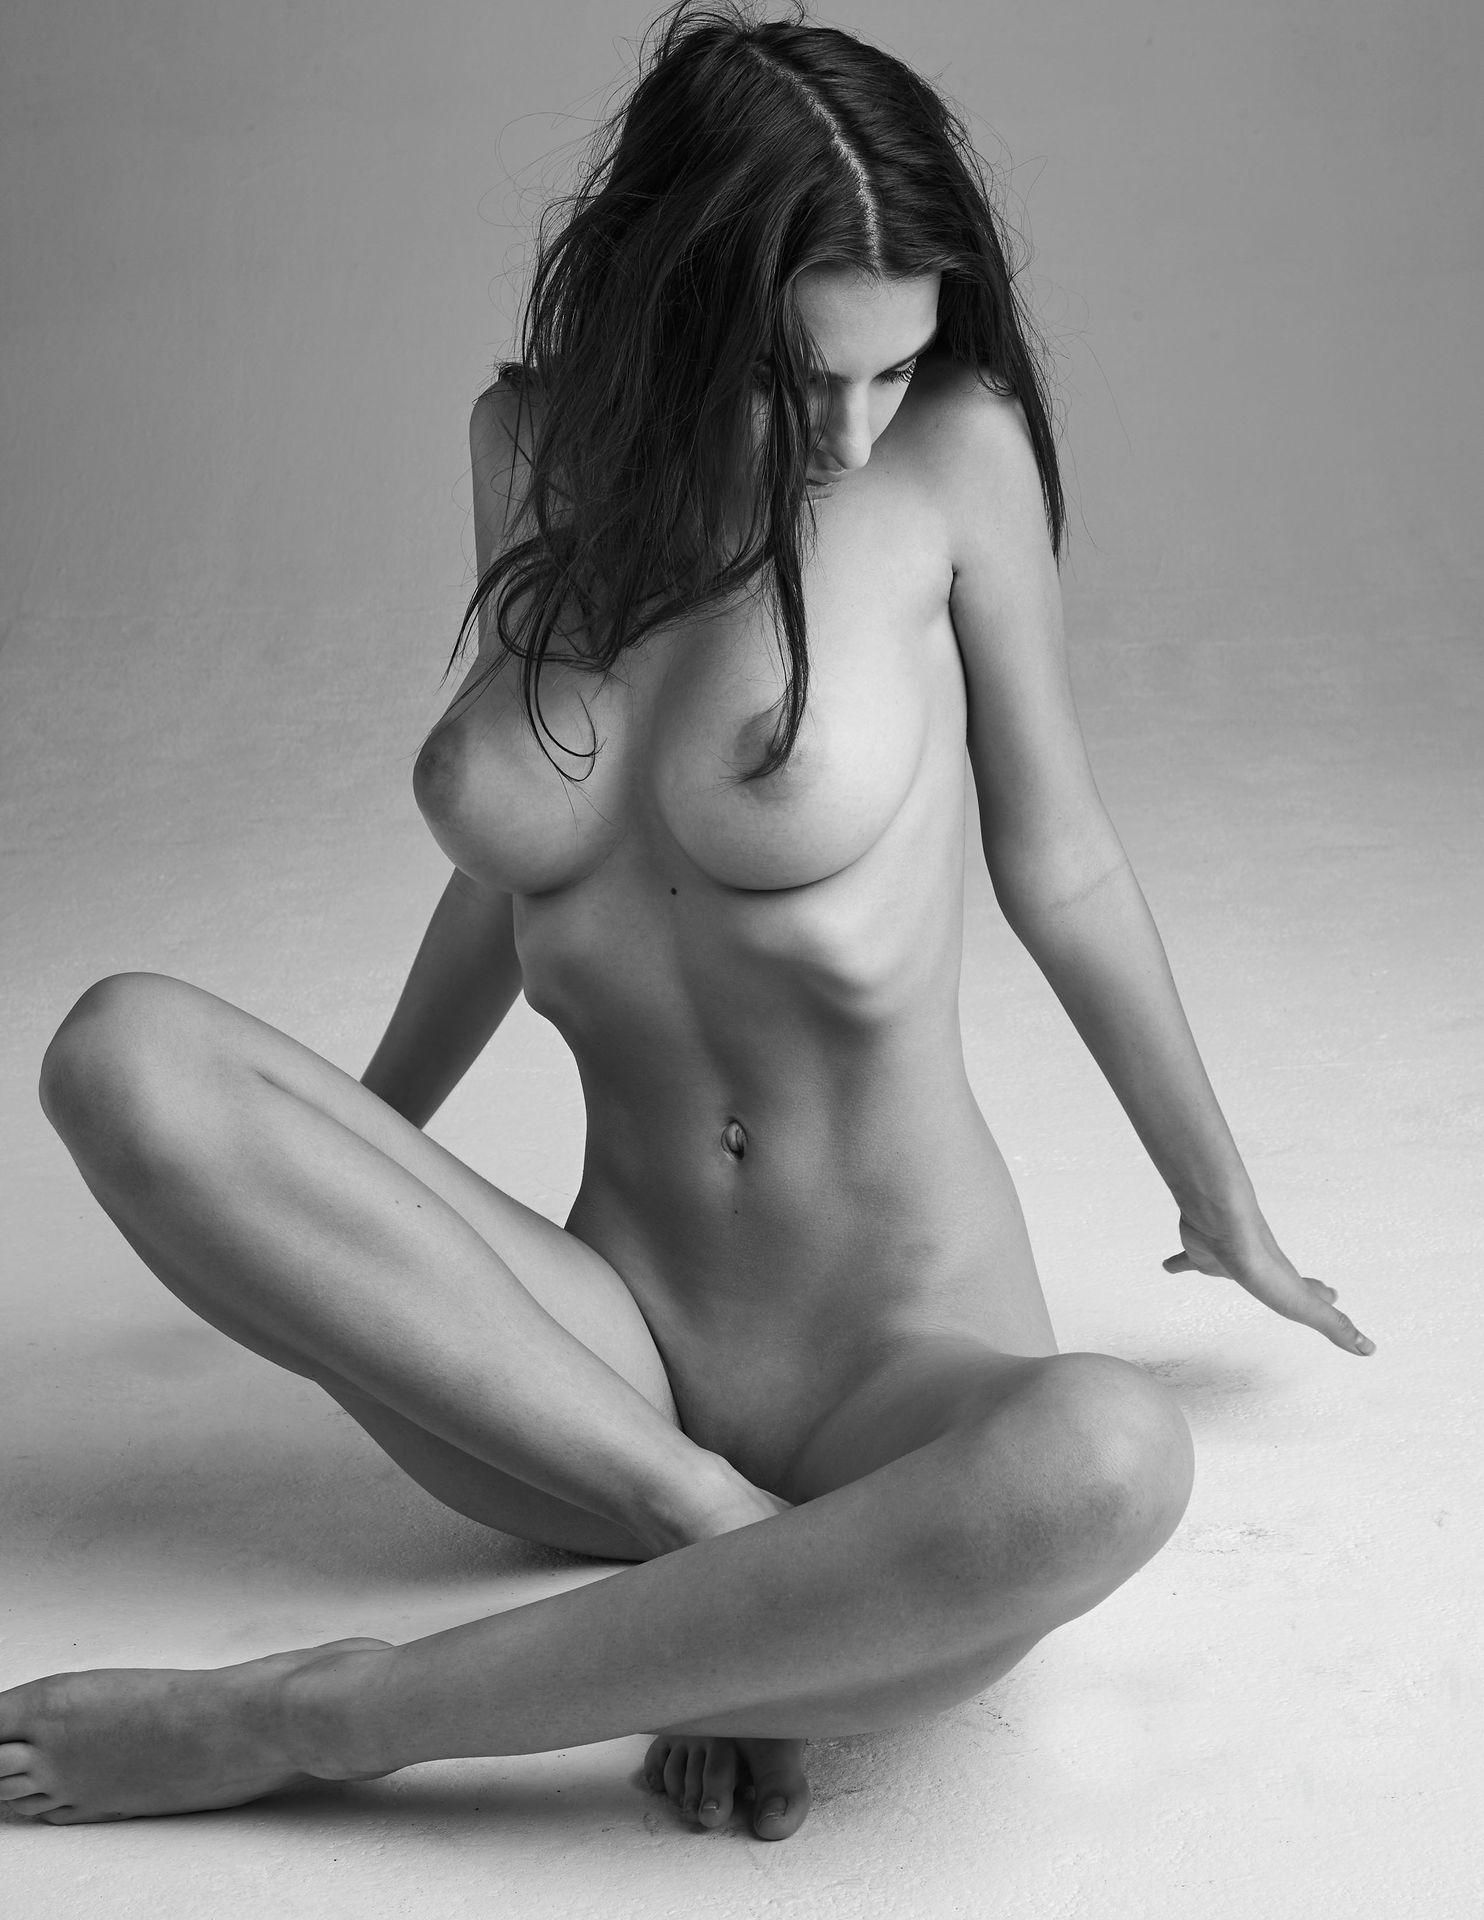 Emily-Ratajkowski-Nude-25-thefappeningblog.com_.jpg